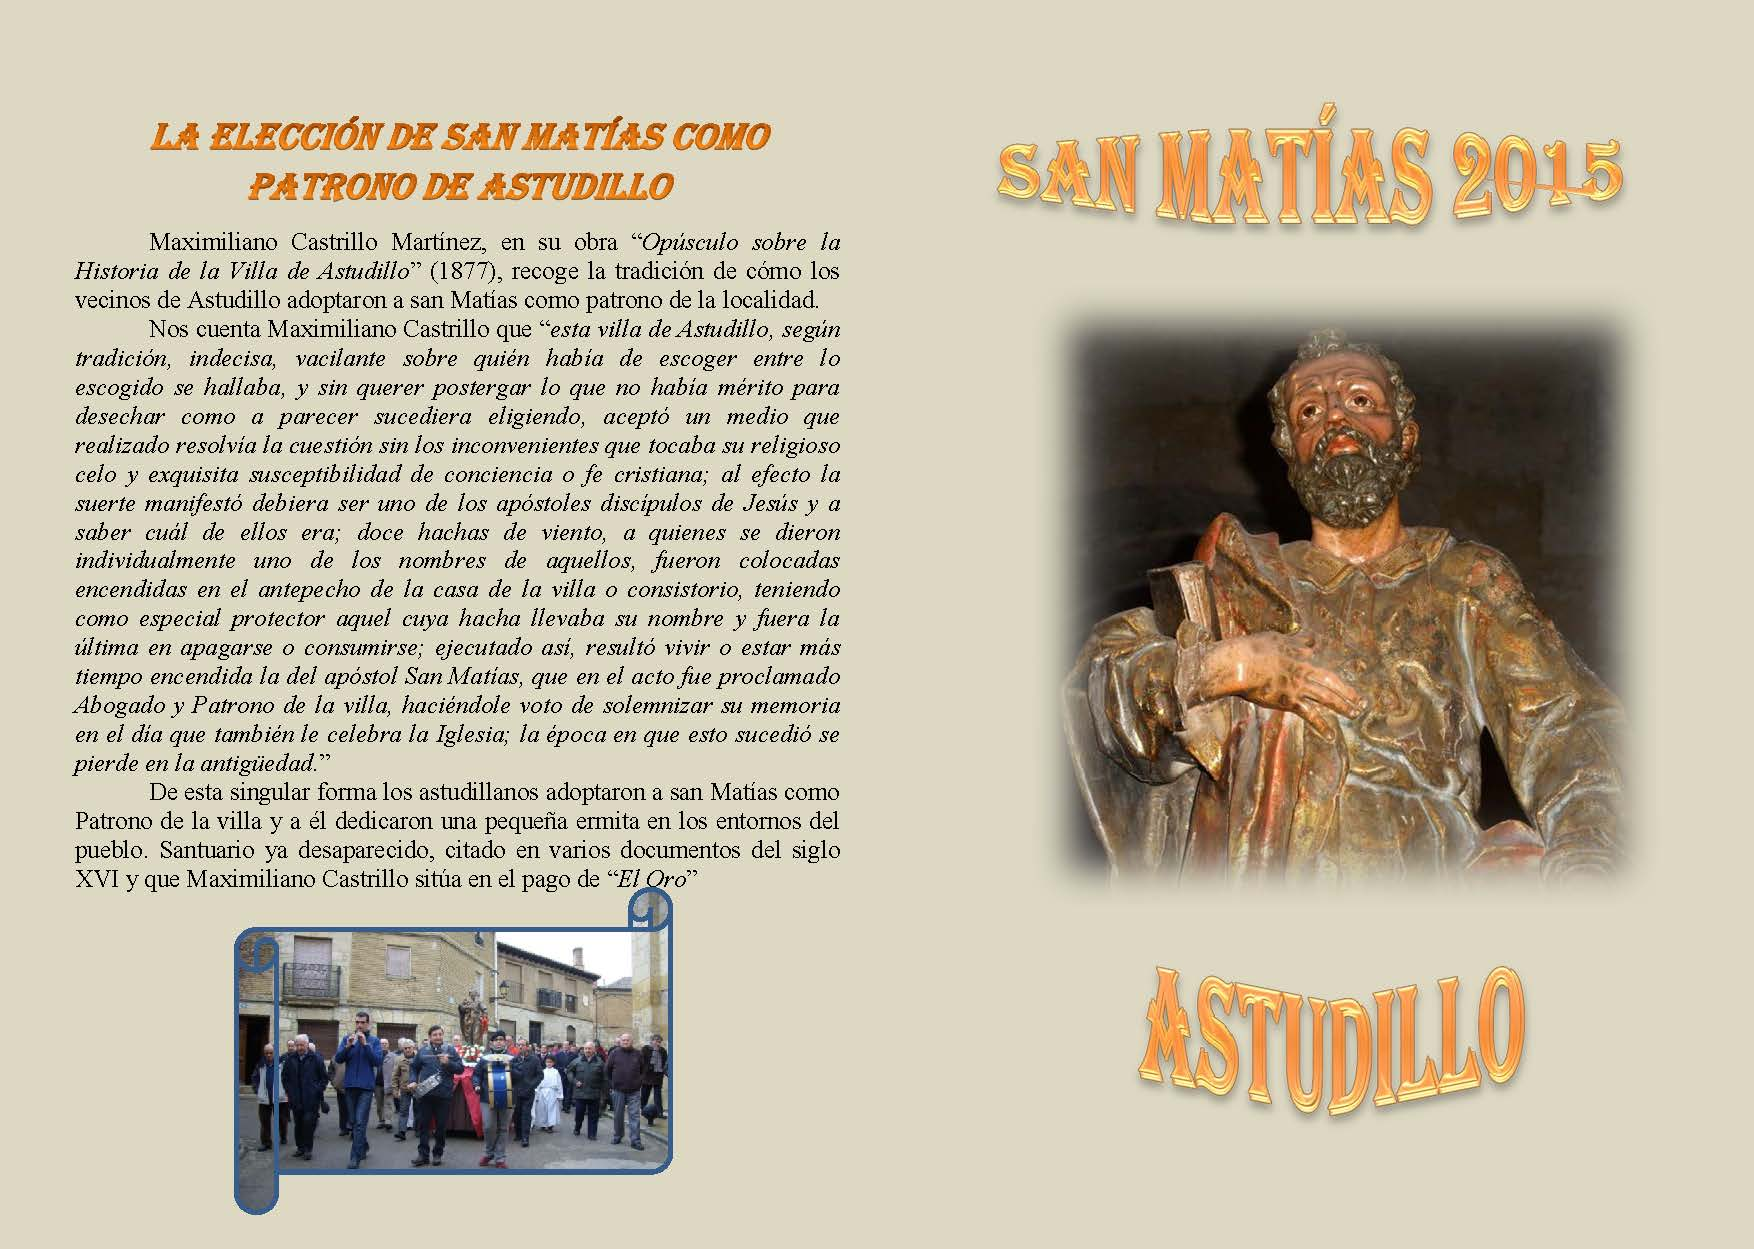 San Matías 2015